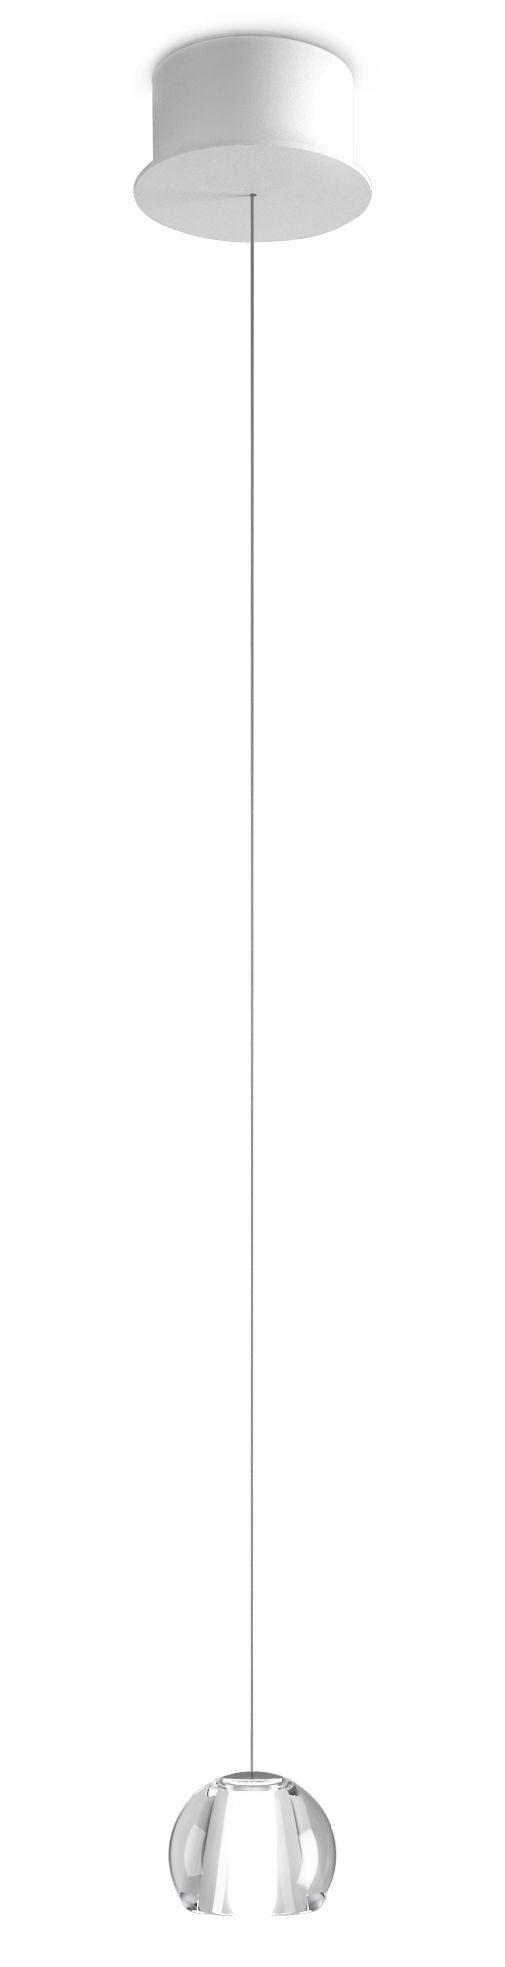 Lighting - Pendant Lighting - Multispot Beluga LED Pendant - LED / 1 element by Fabbian - Transparent - Cristal